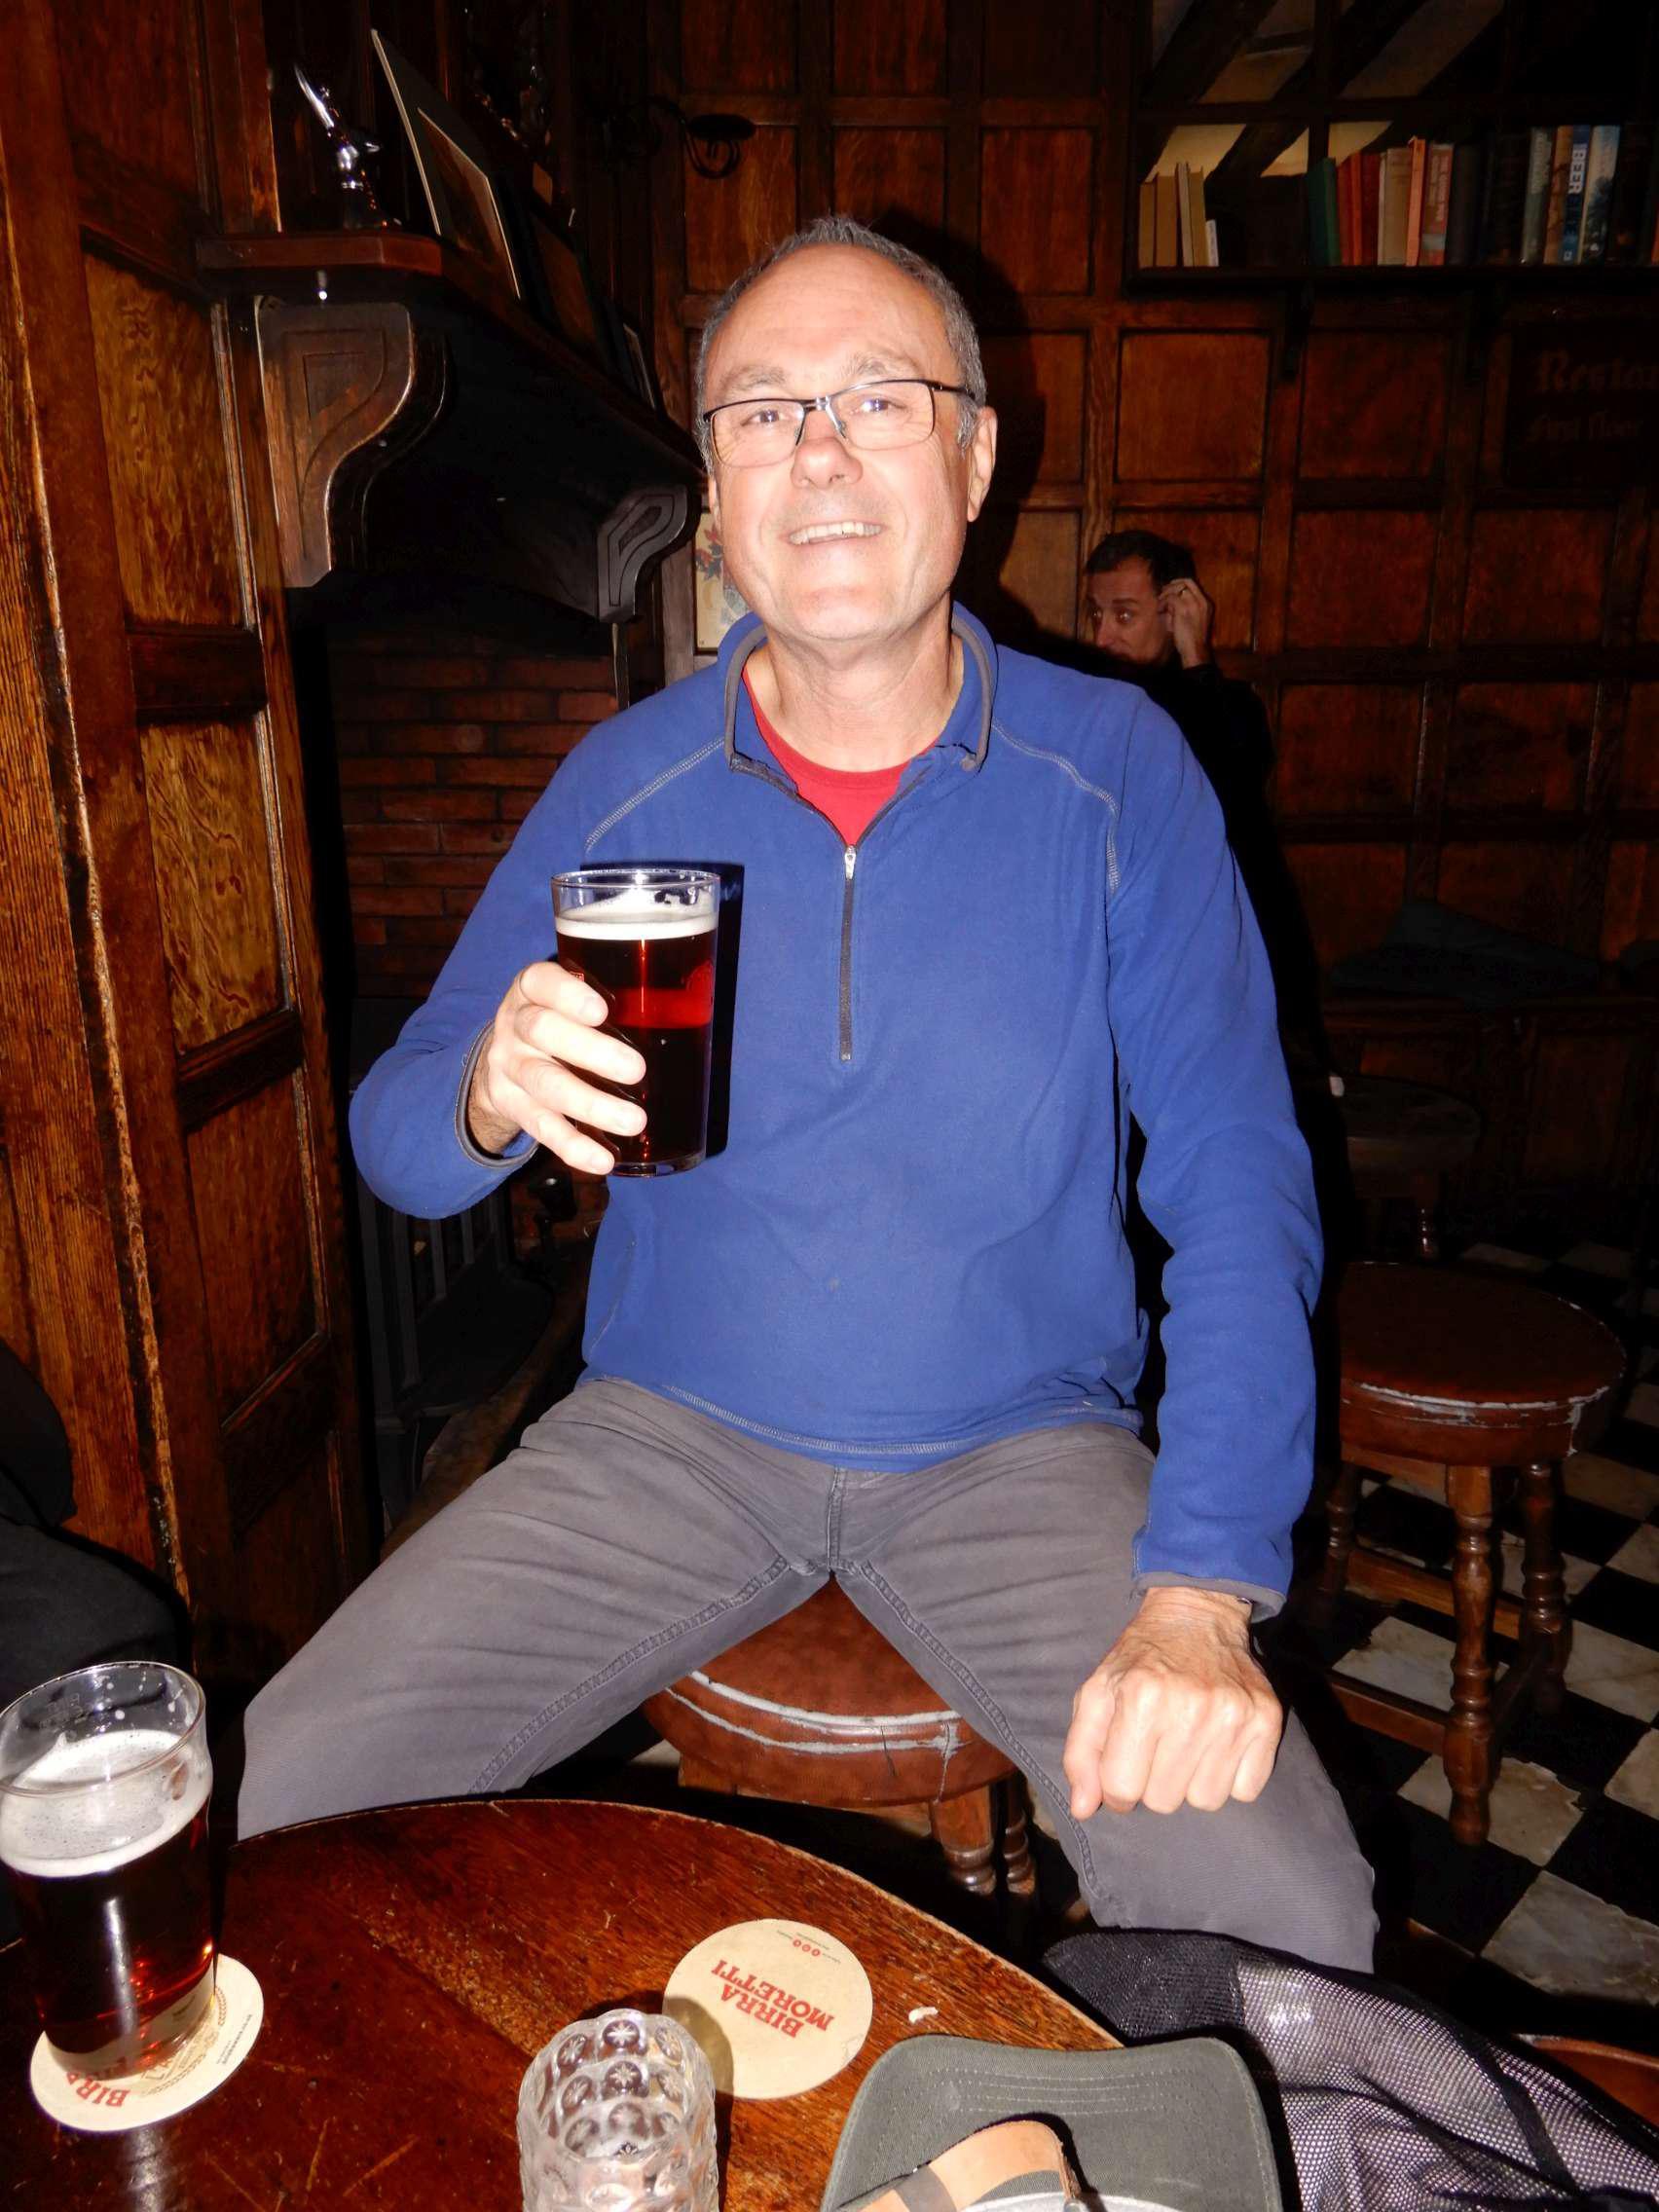 Roger, enjoying his pint